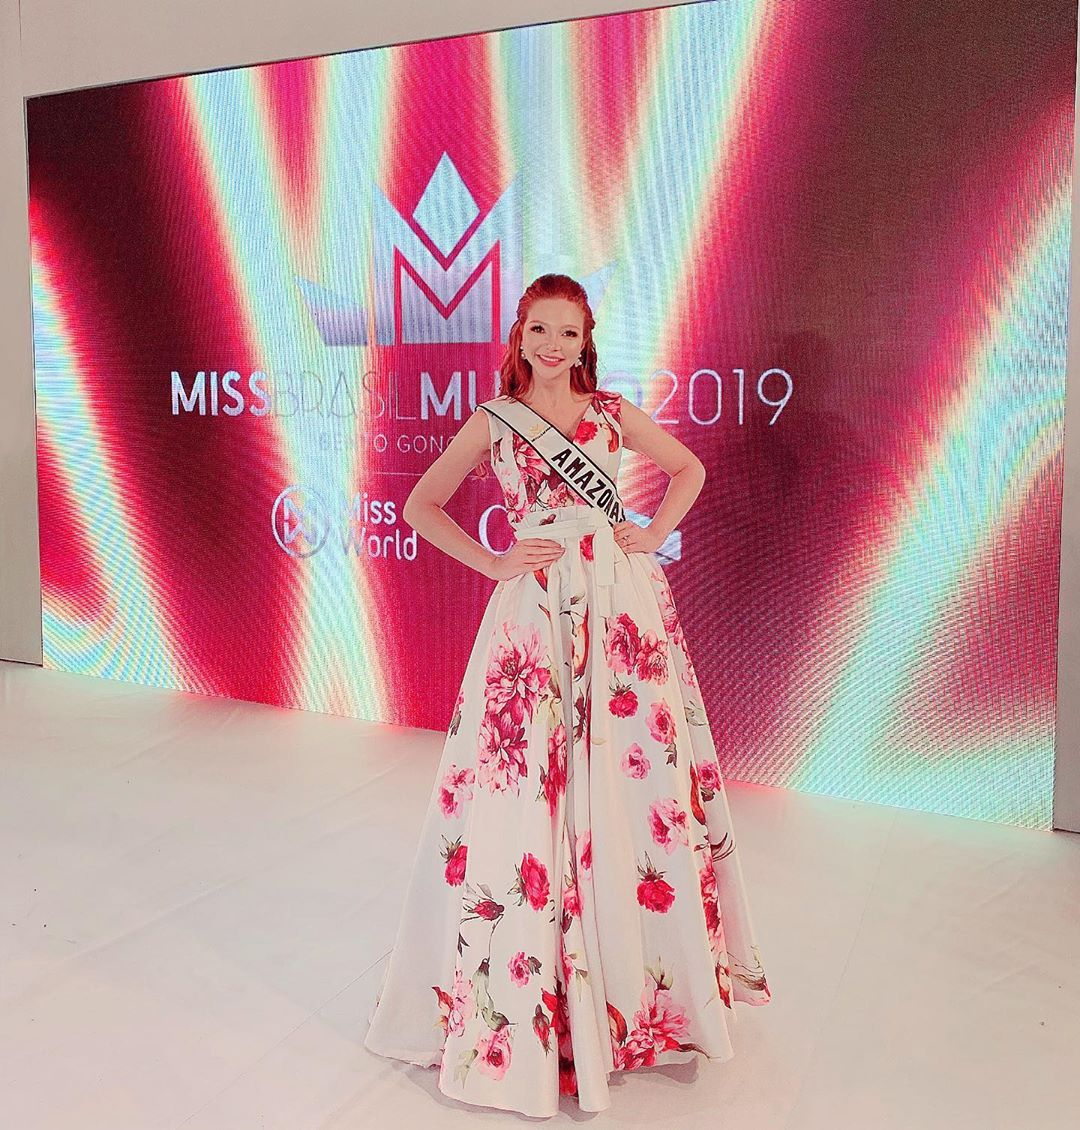 nathaly felix, top 20 de miss brasil mundo 2019. - Página 3 69070811